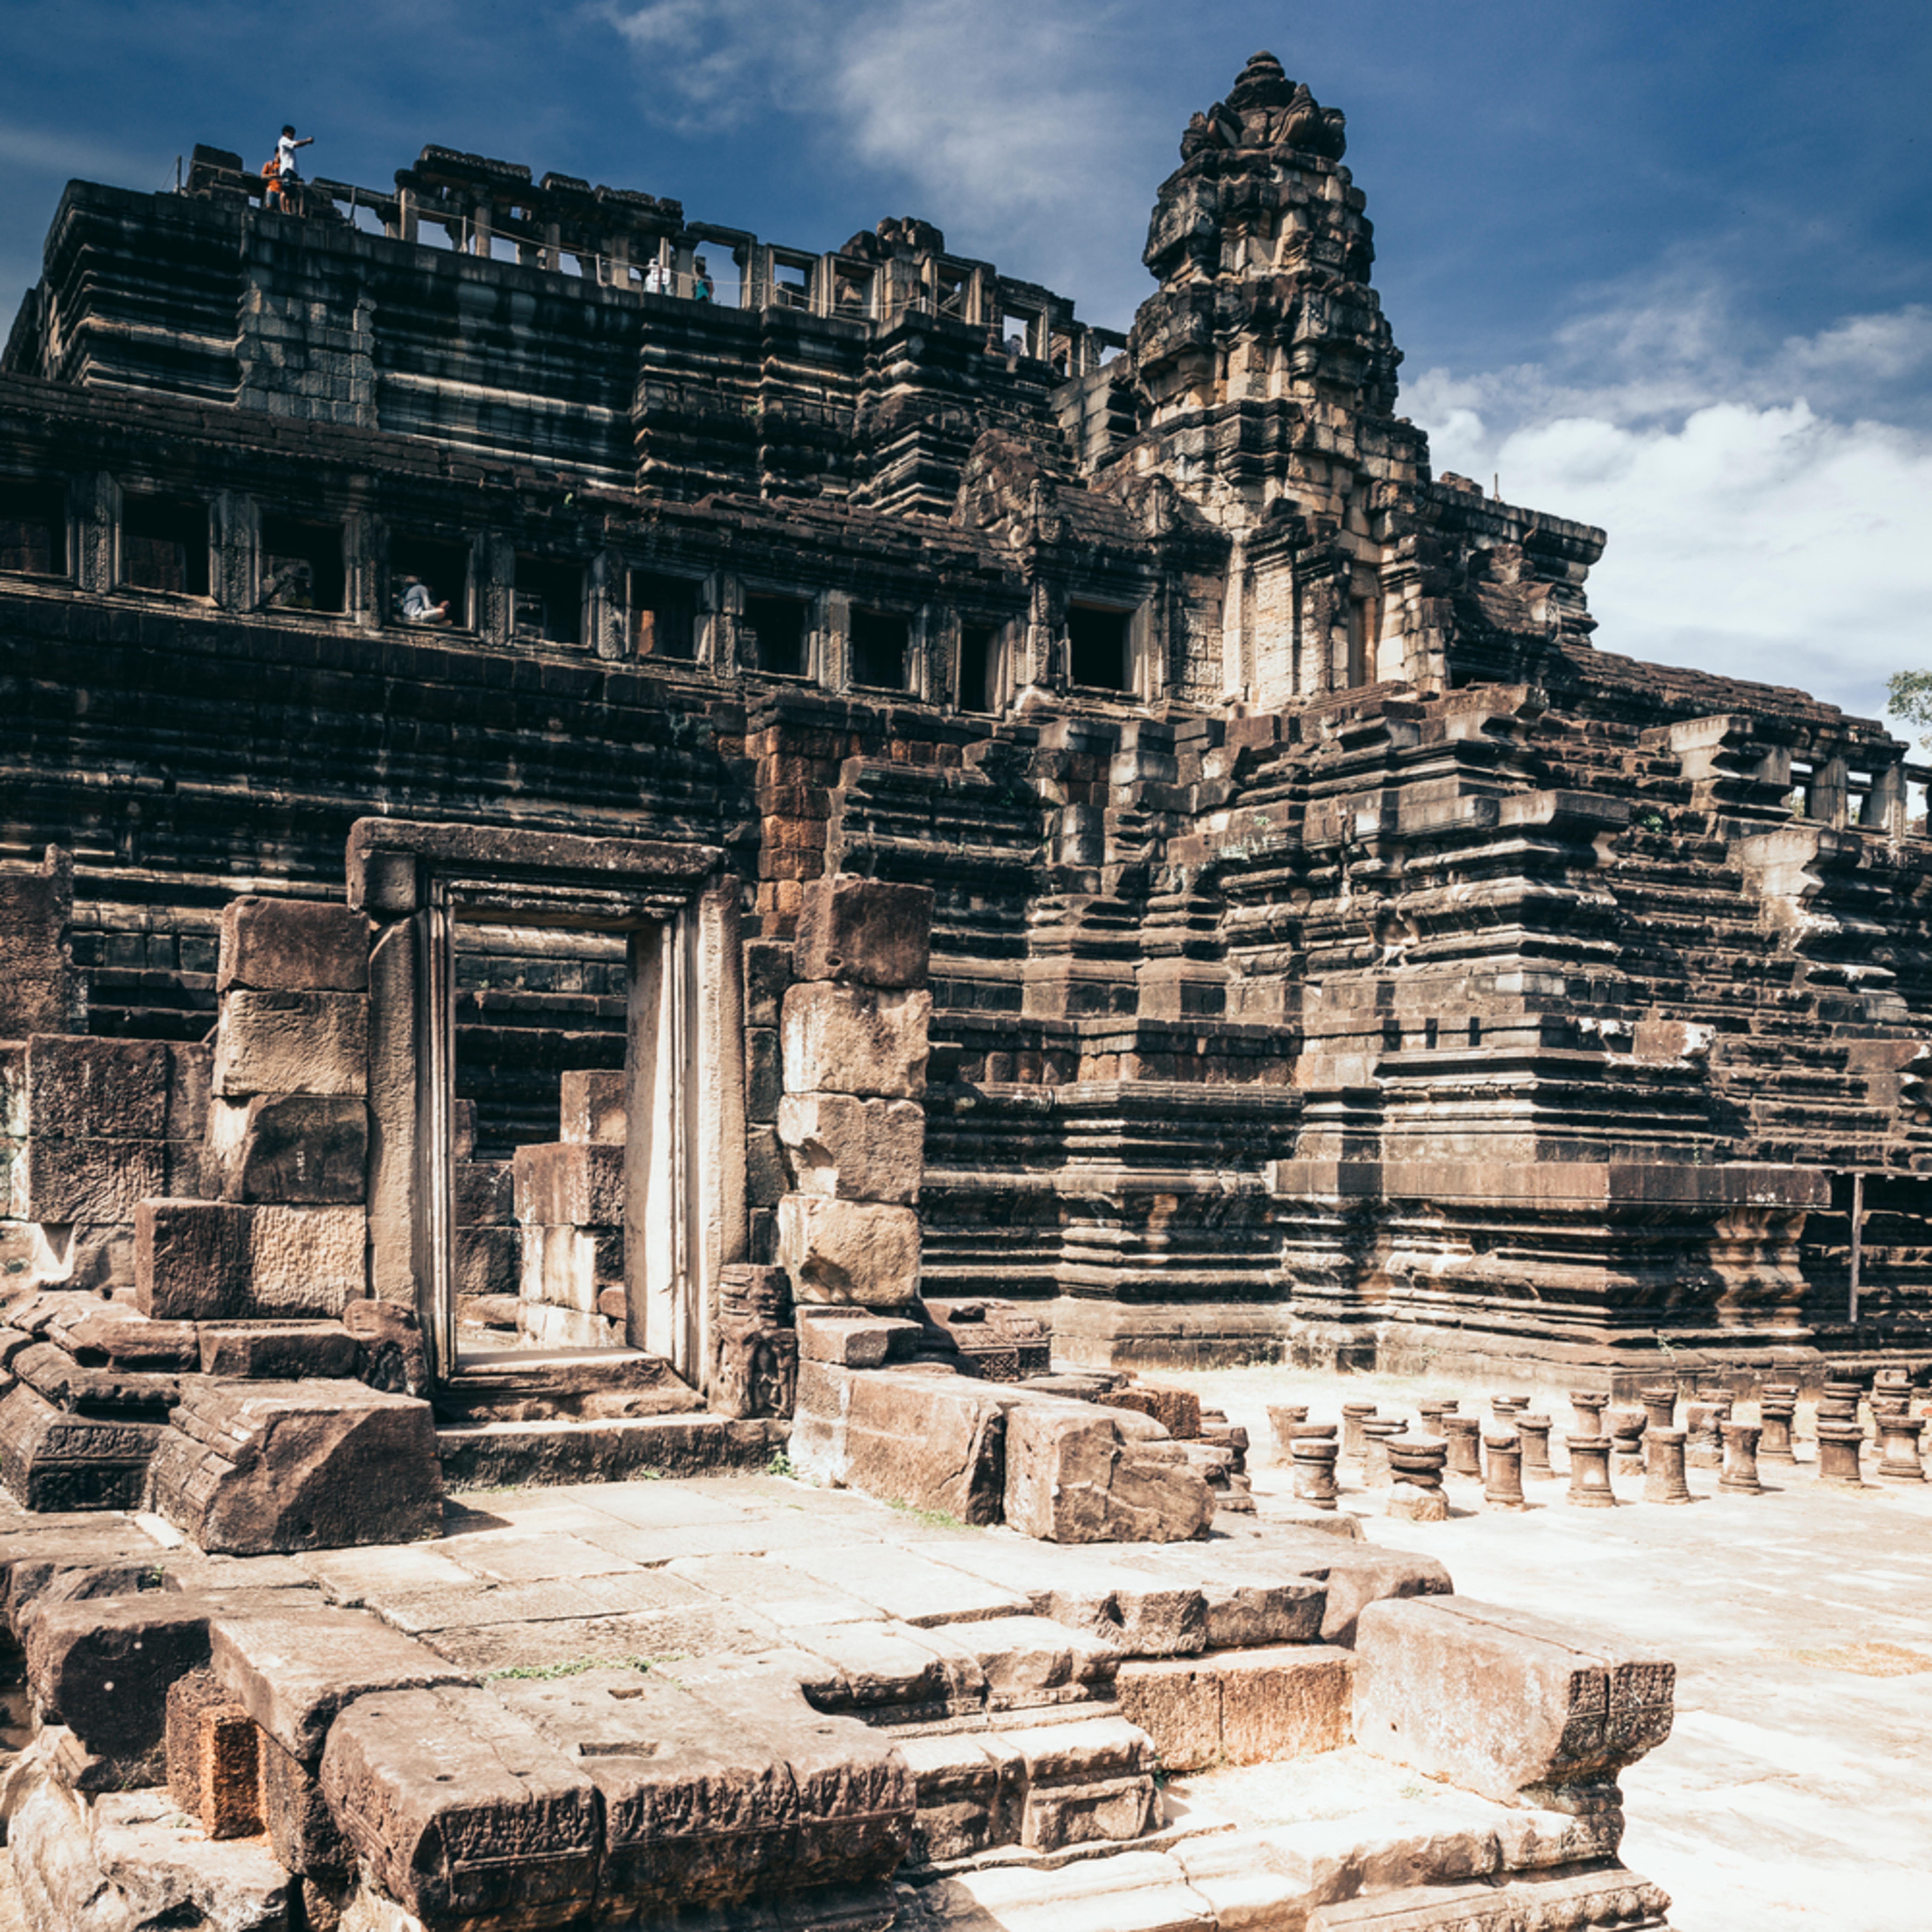 20151218 travel cambodia siemreap 0246 edit mtbssy